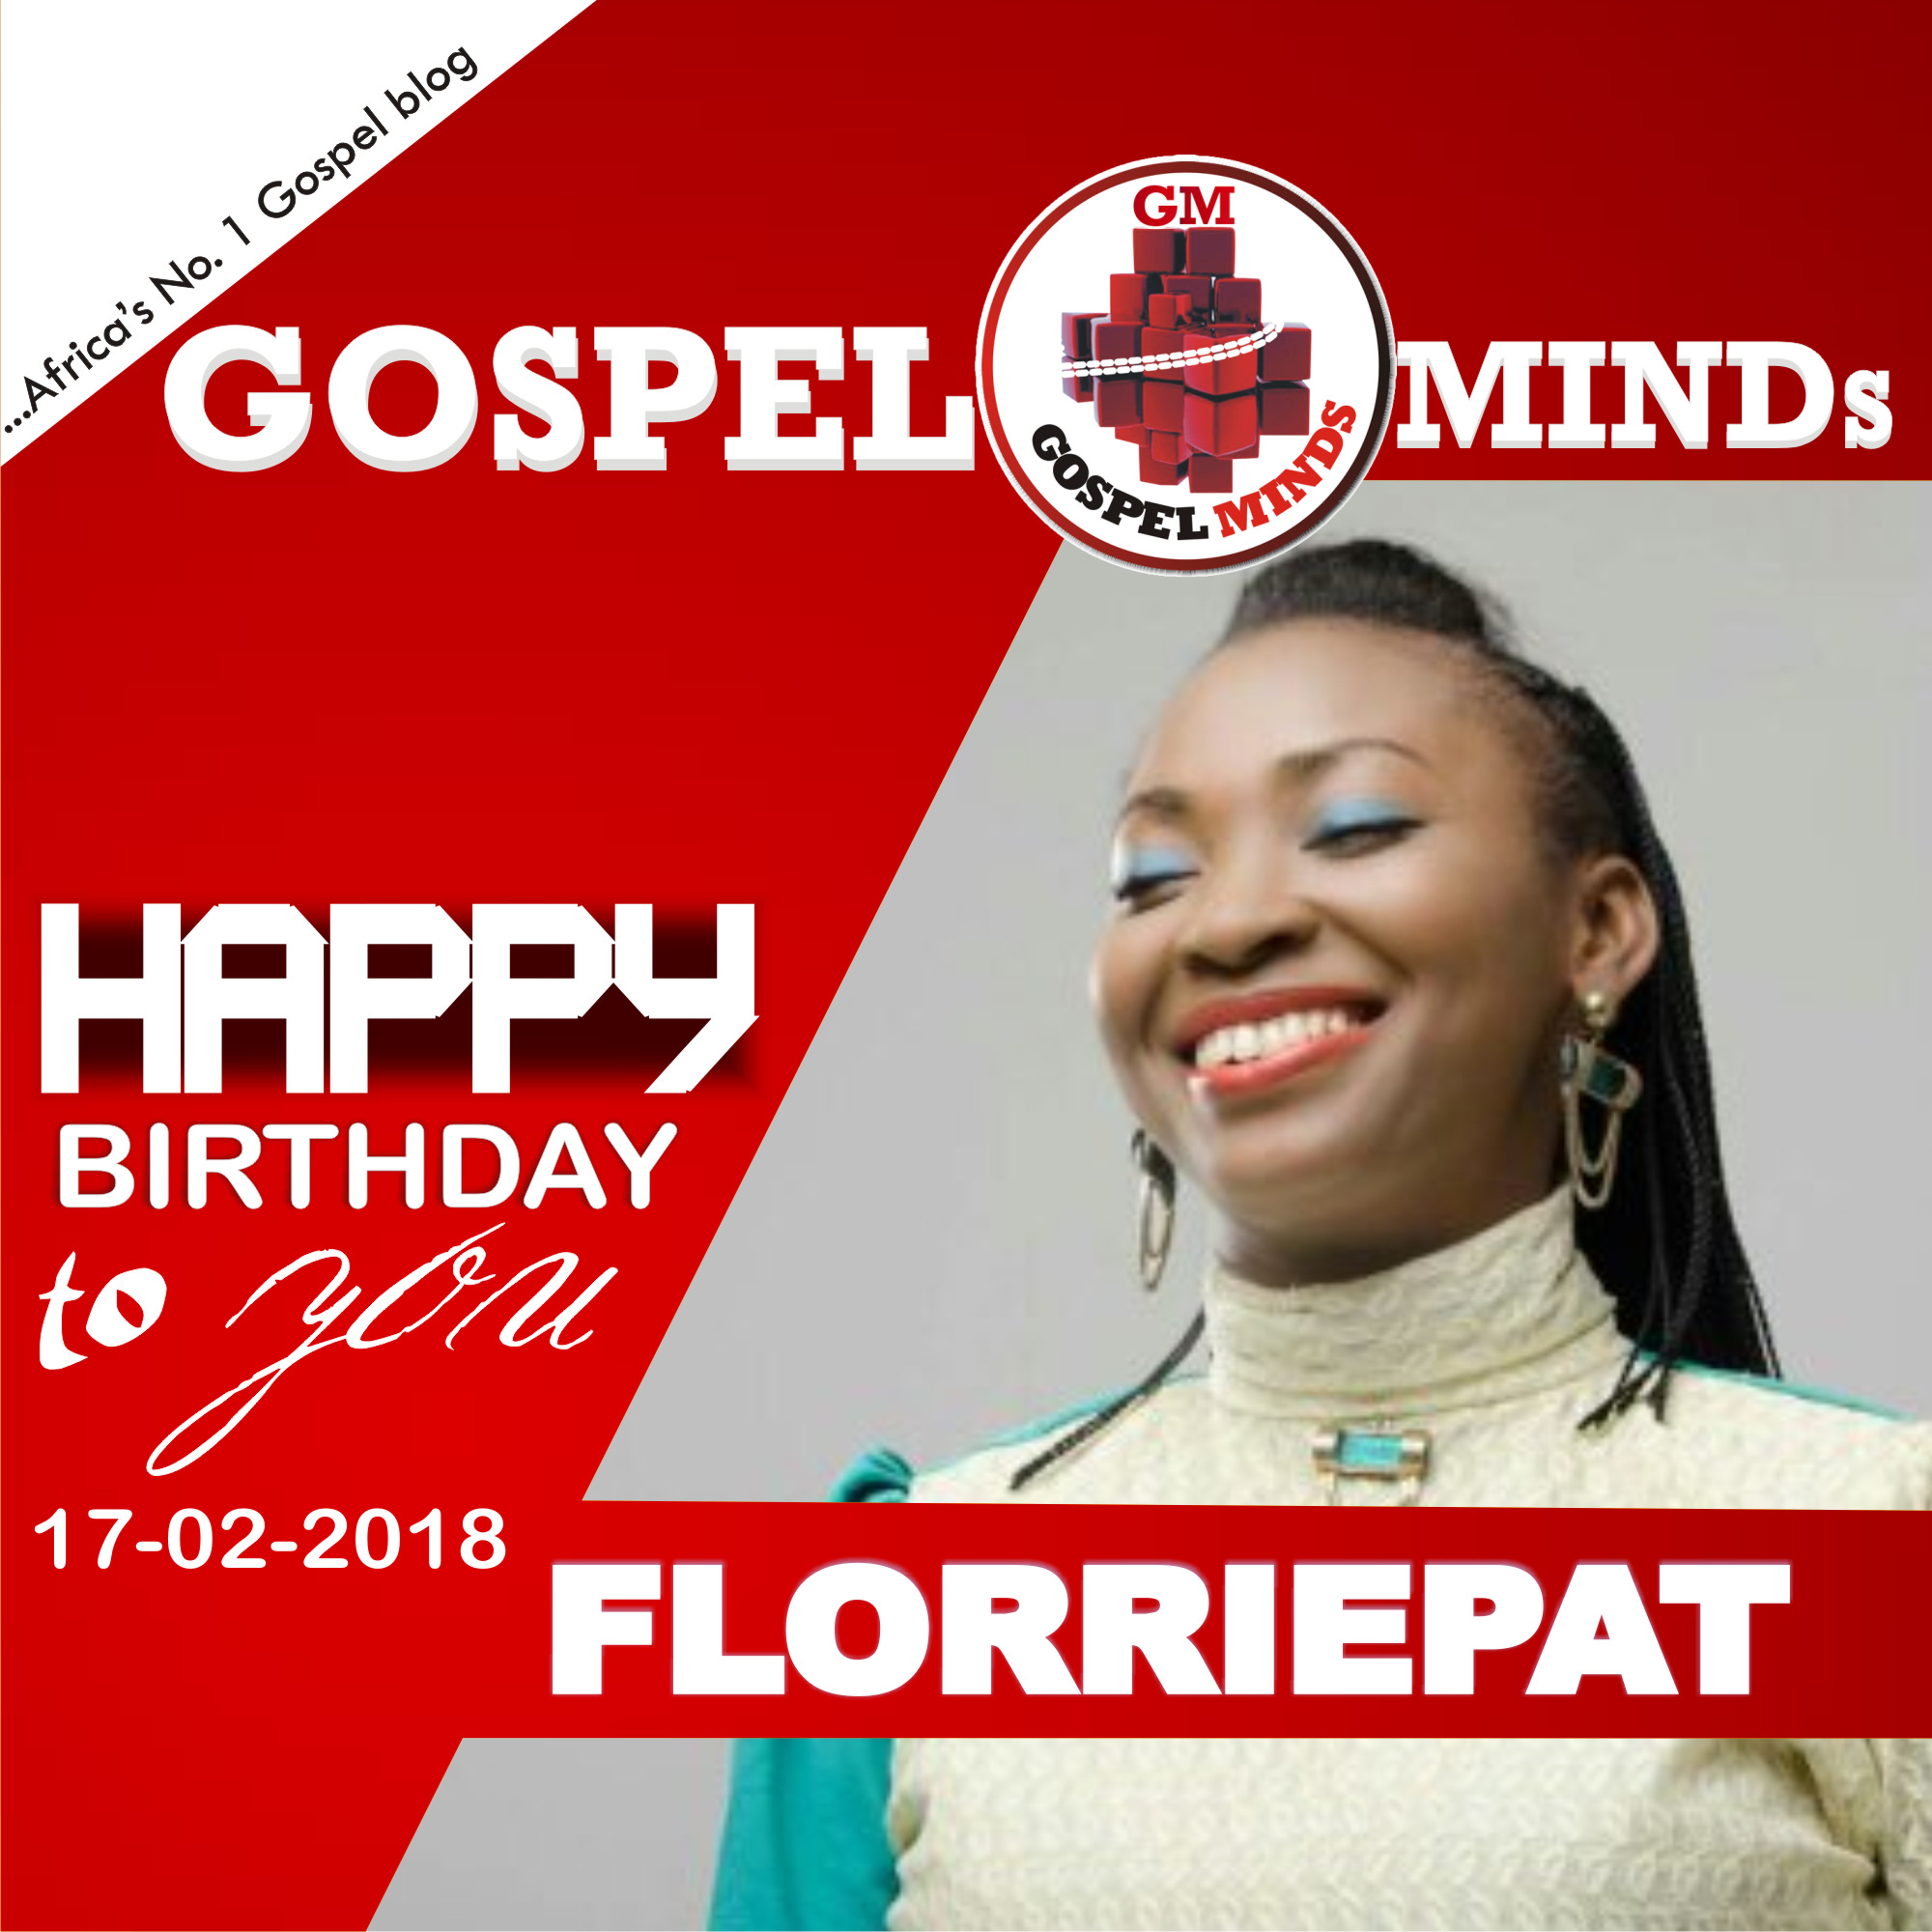 femaleGospel Artist Florriepat 2